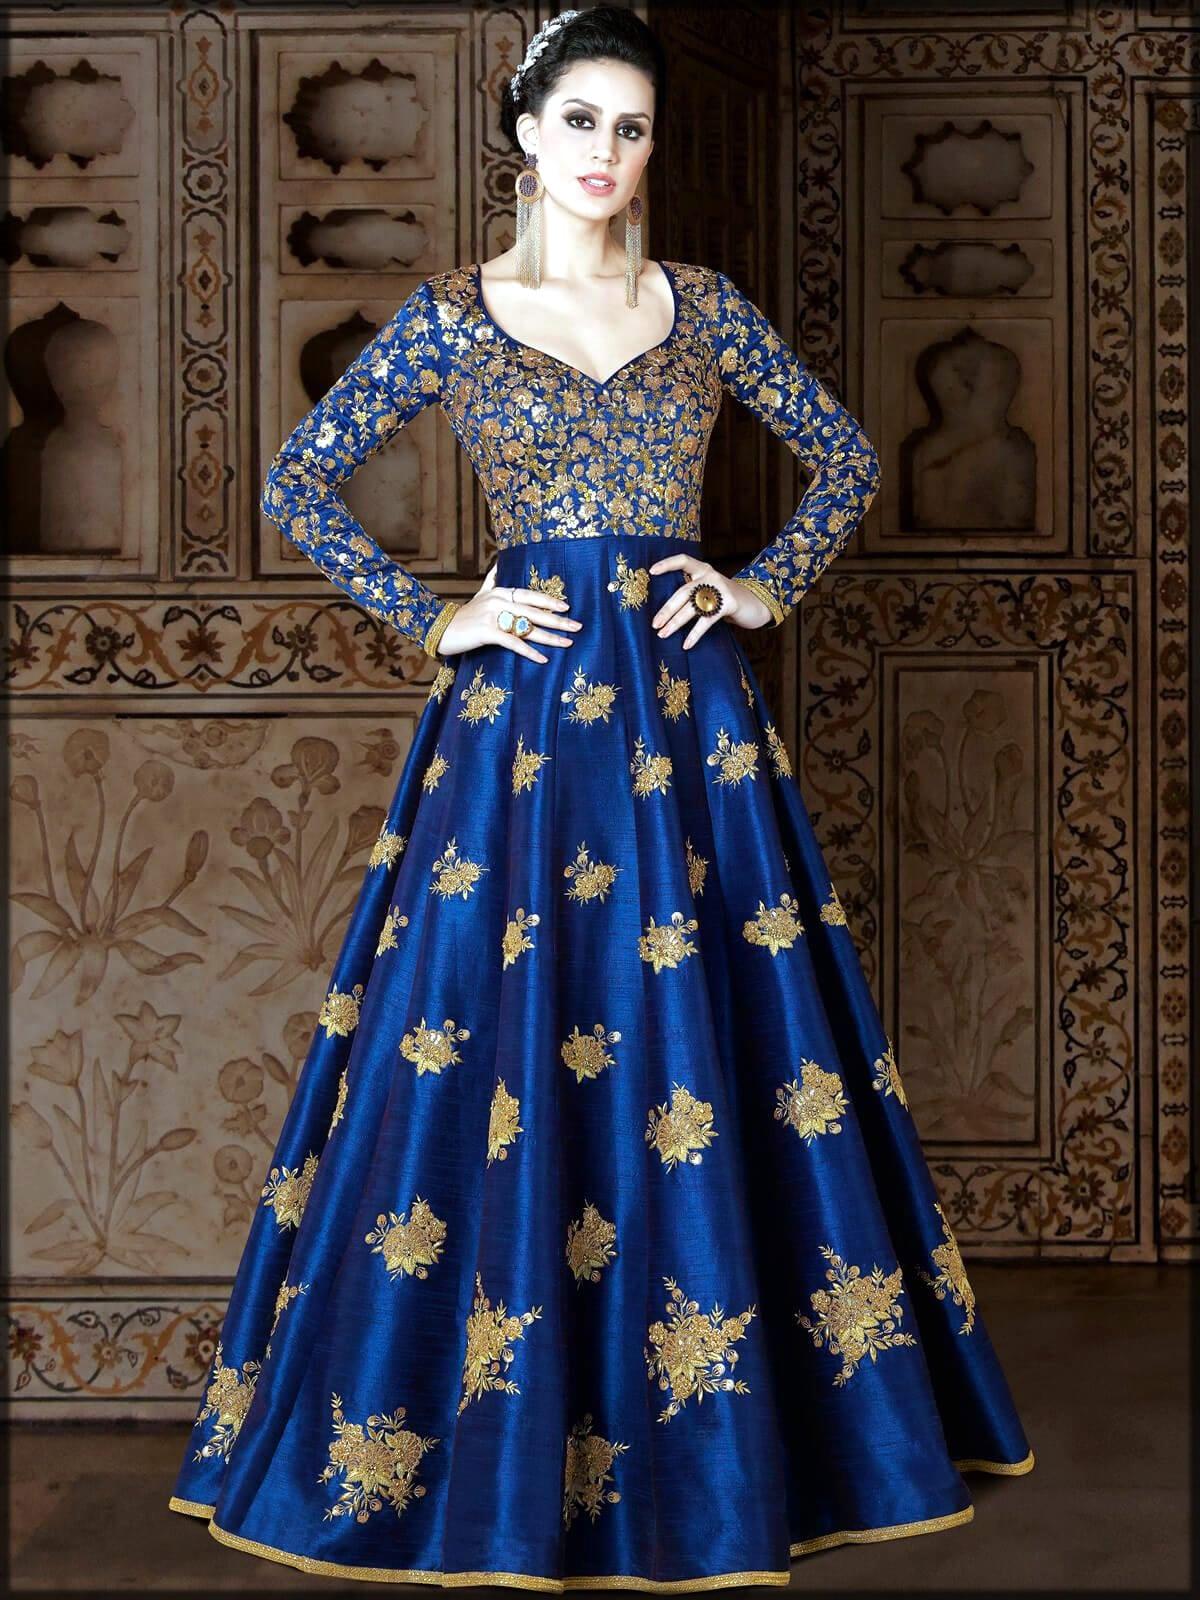 Royal bluie silk dress